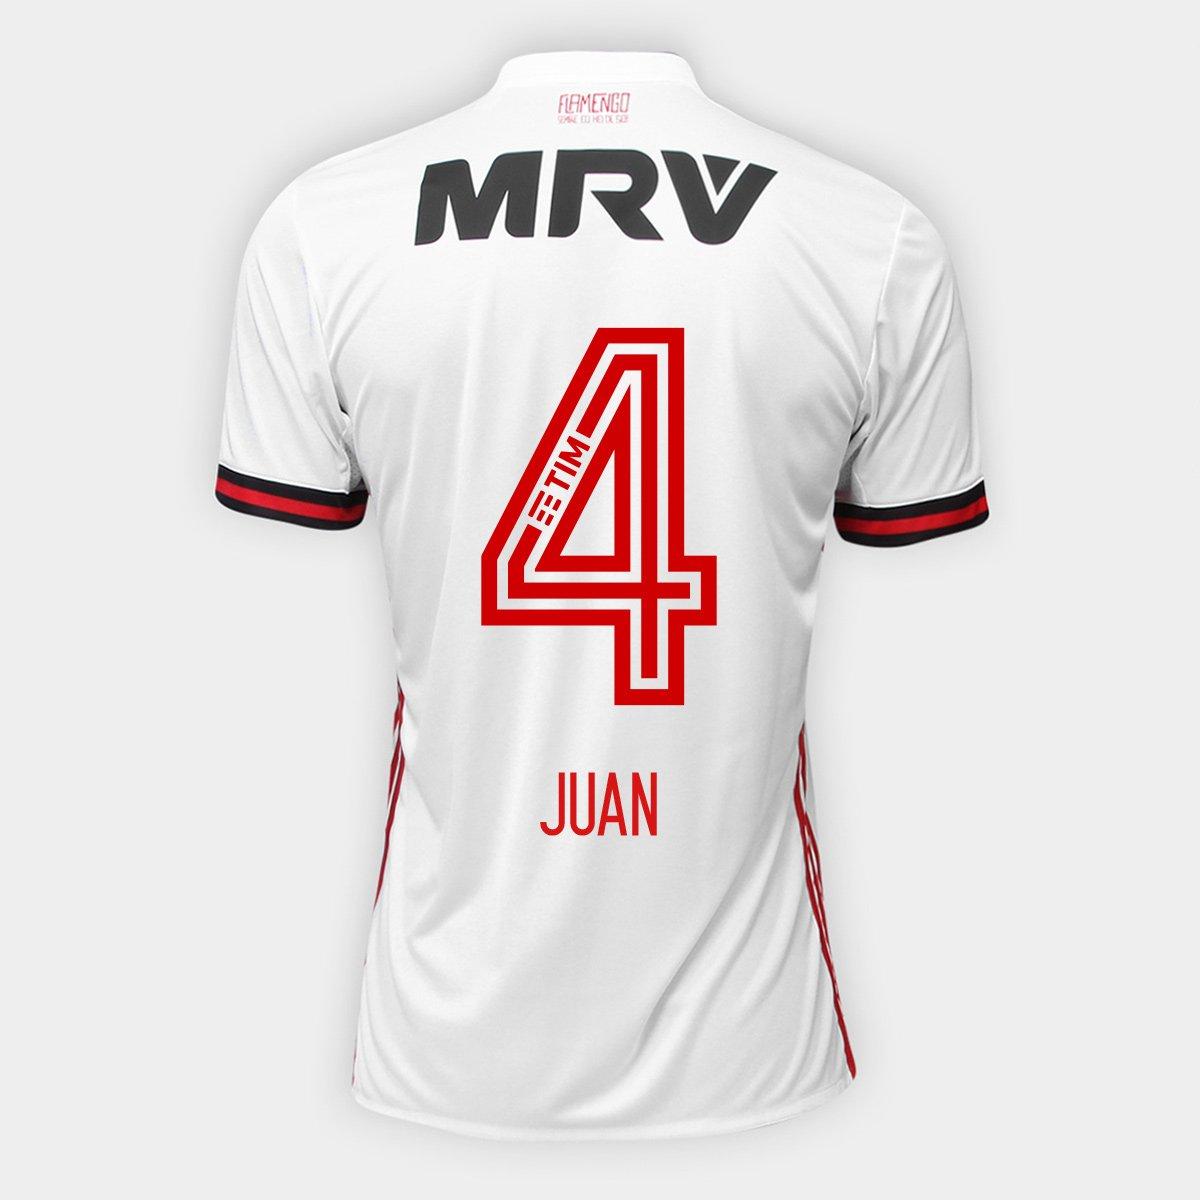 63a945e537 Camisa Flamengo II 17 18 N° 4 - Juan Torcedor Adidas Masculina - Compre  Agora